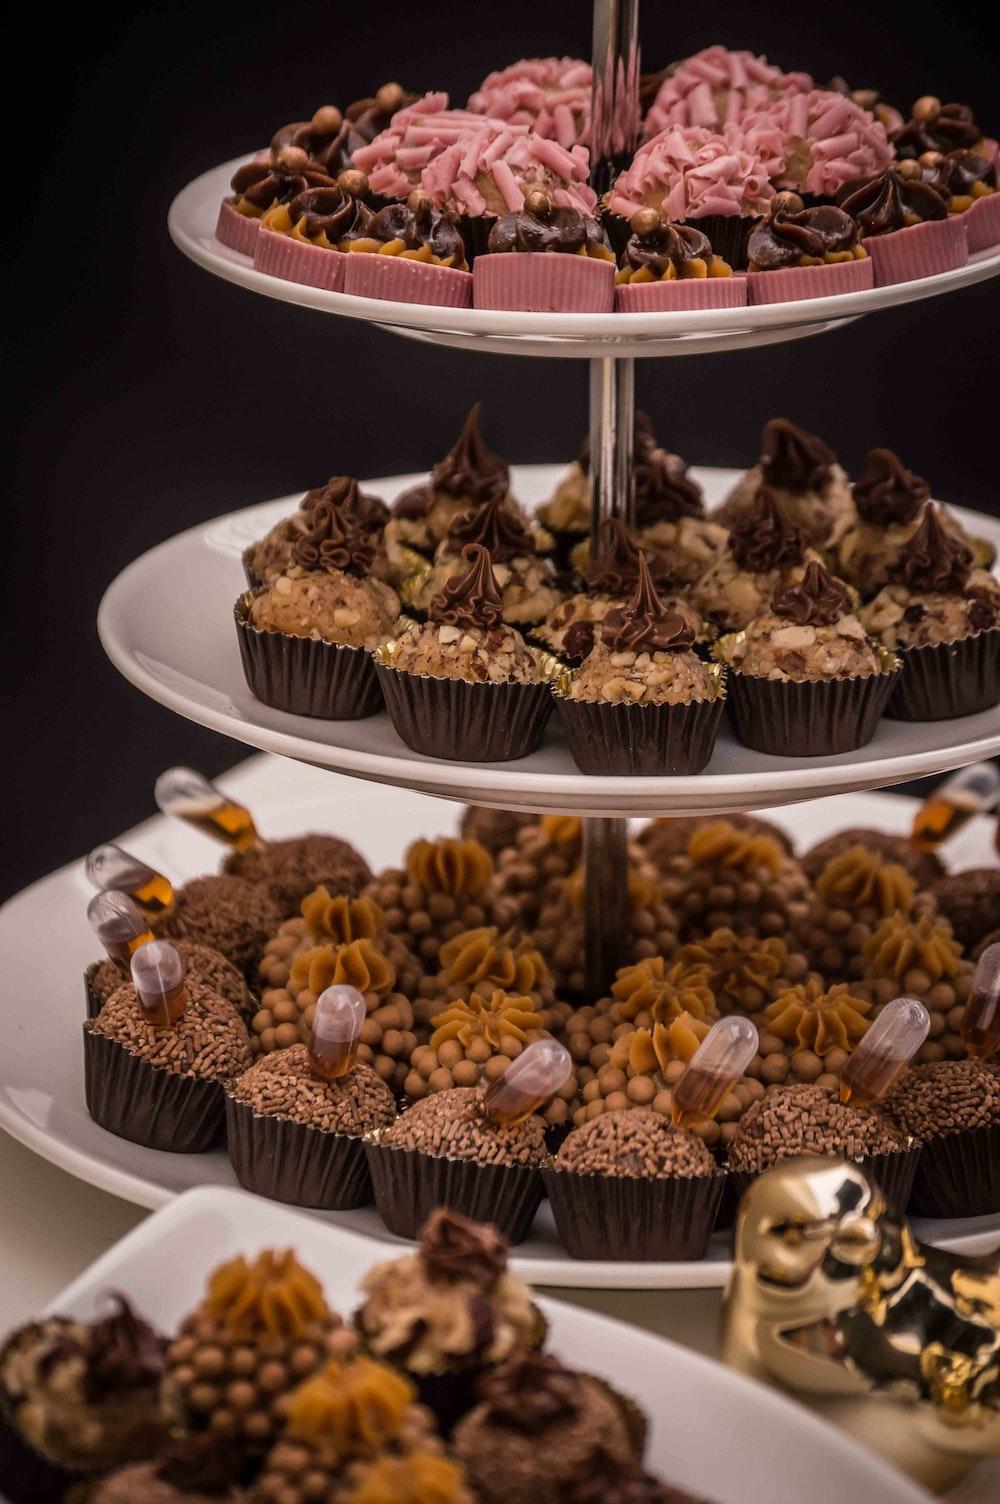 variety of cupcakes on cupcake rack